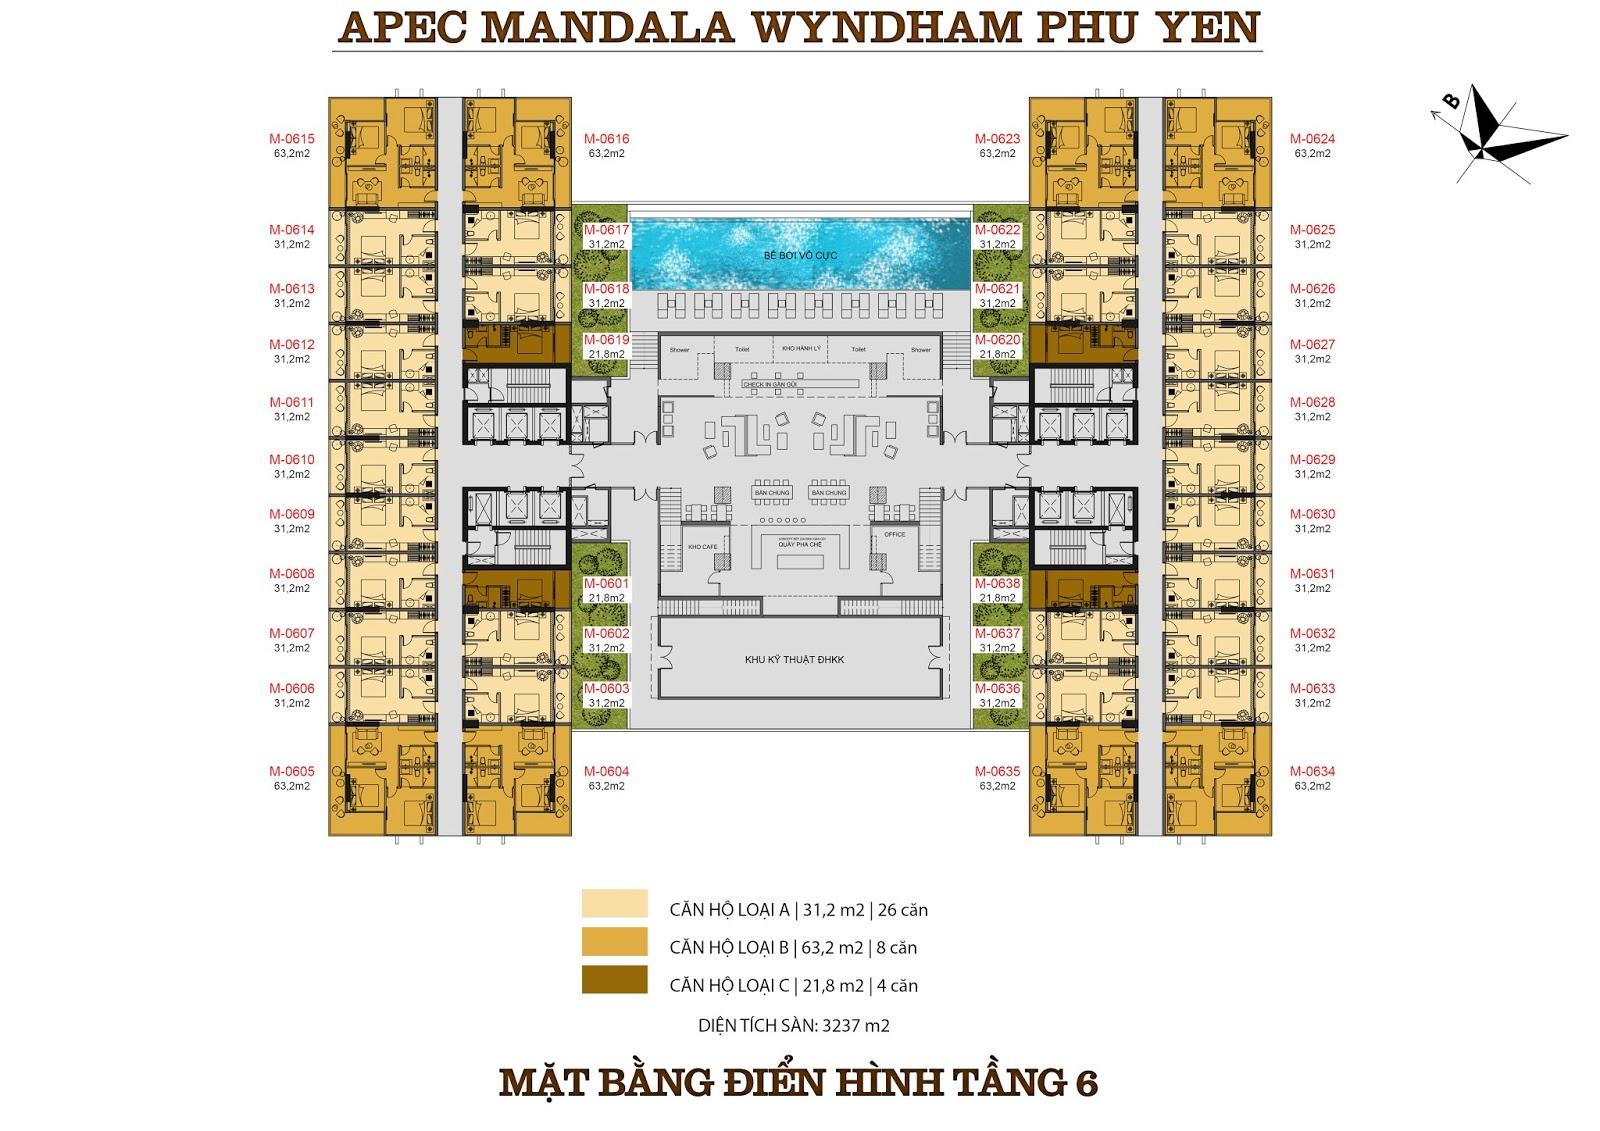 Mặt bằng căn Condotel Apec Mandala Wyndham Phú Yên